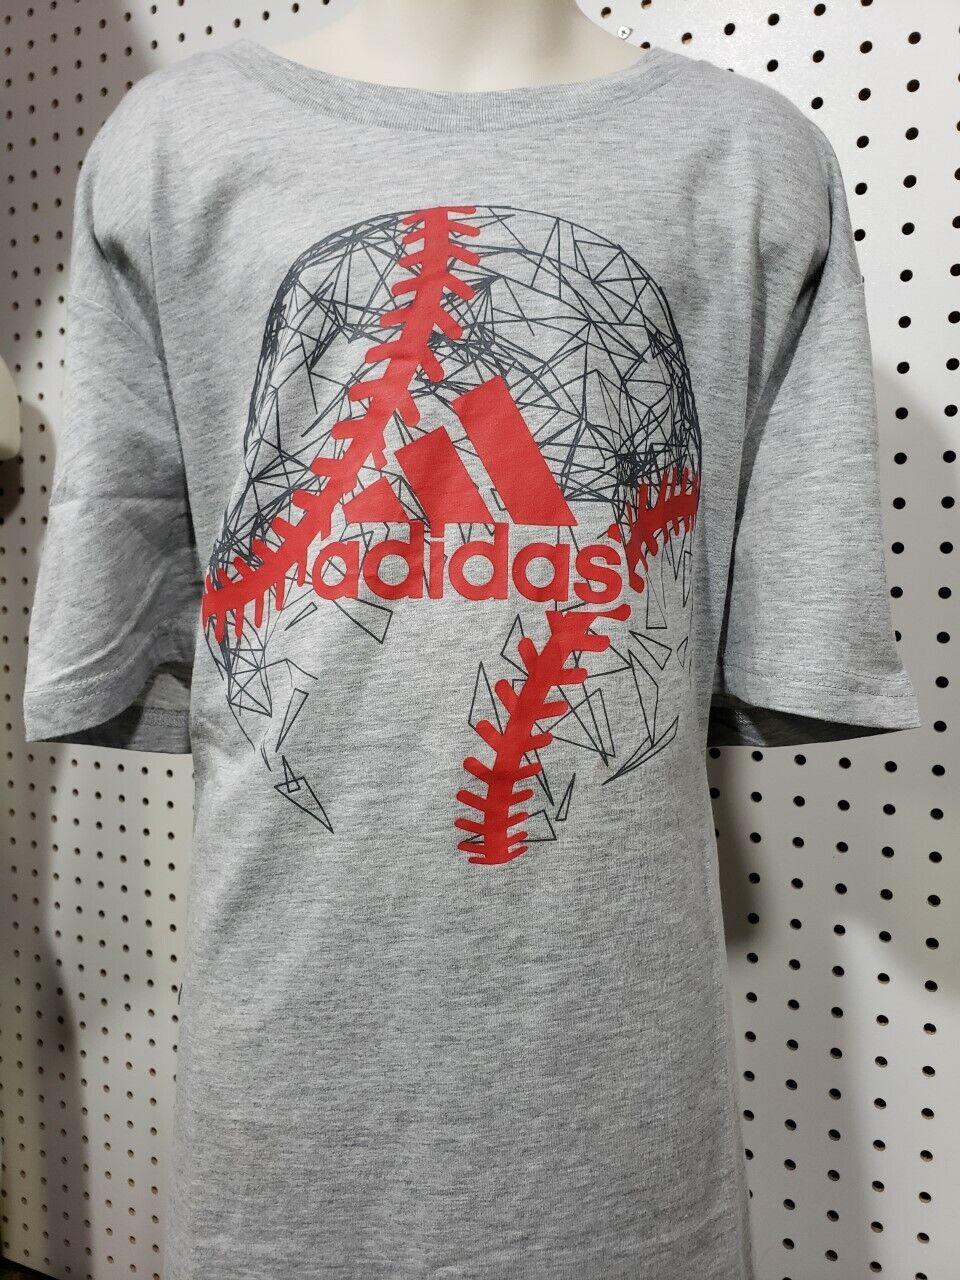 Boys Kids Youth ADIDAS Shirt NEW Grey short sleeve Size XL